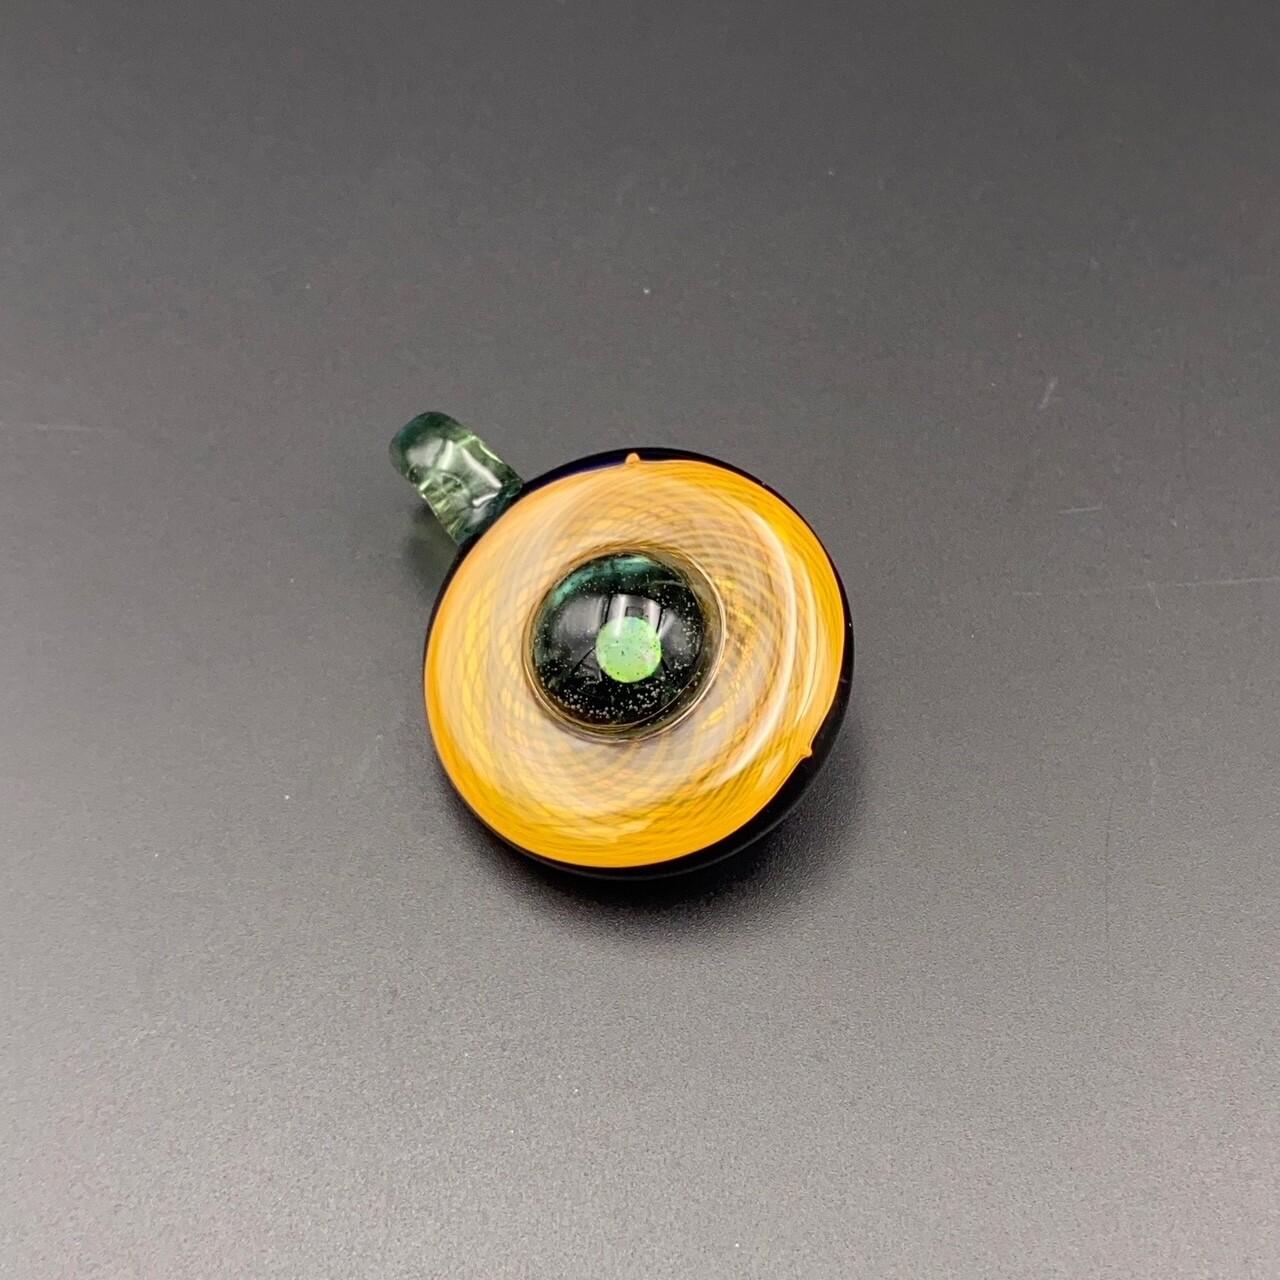 Nib Glass (FL) Fumicello Pendant w Opal - Green